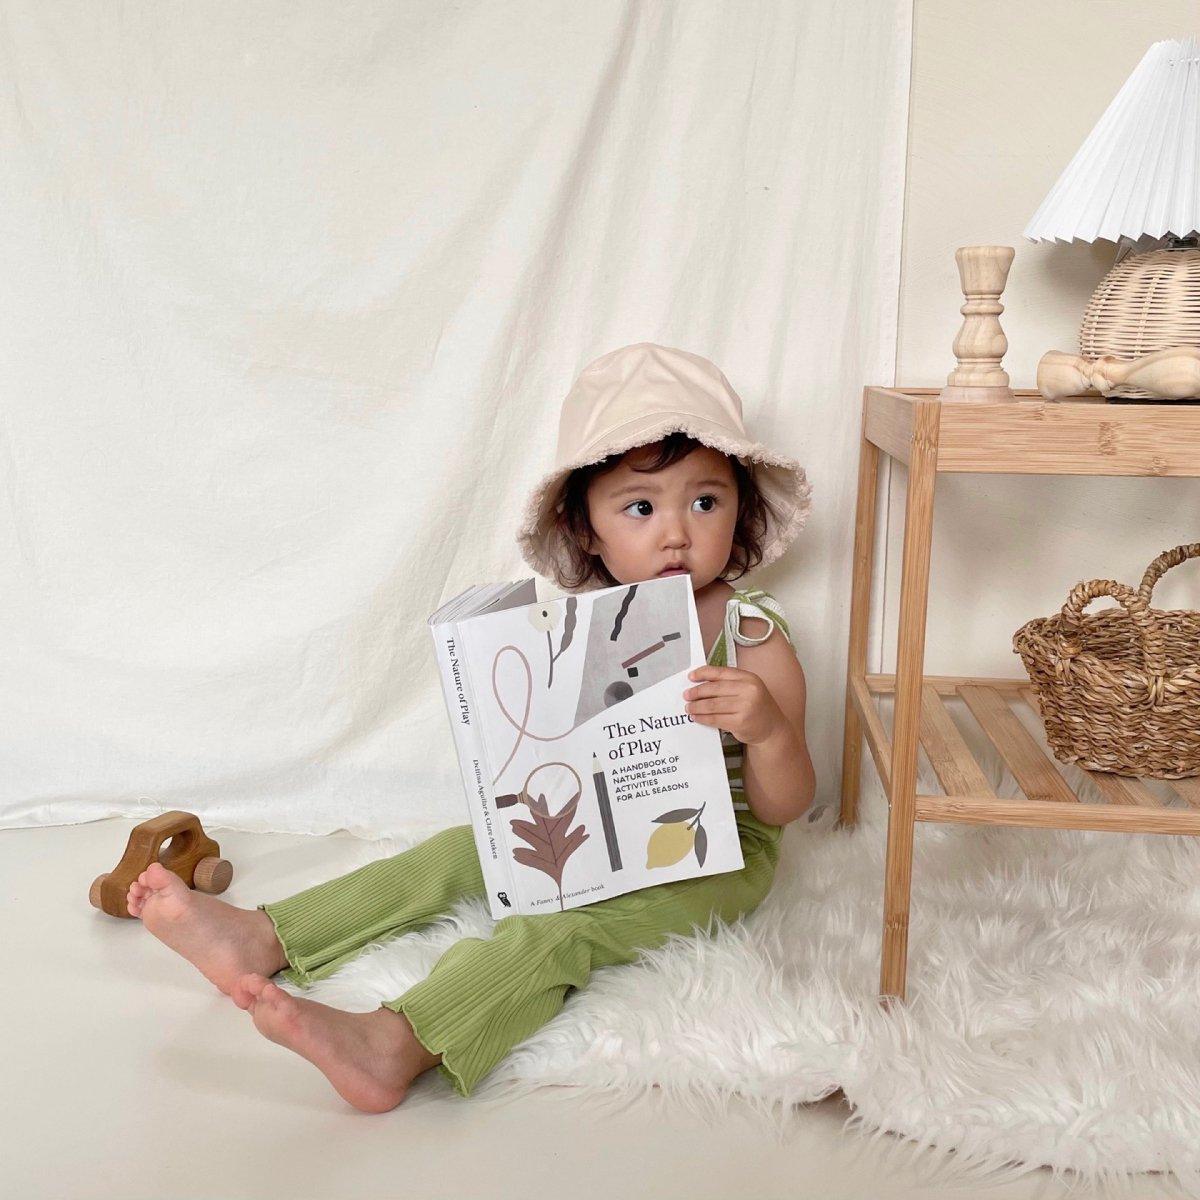 【BABY】Baby Fringe Hat 詳細画像20